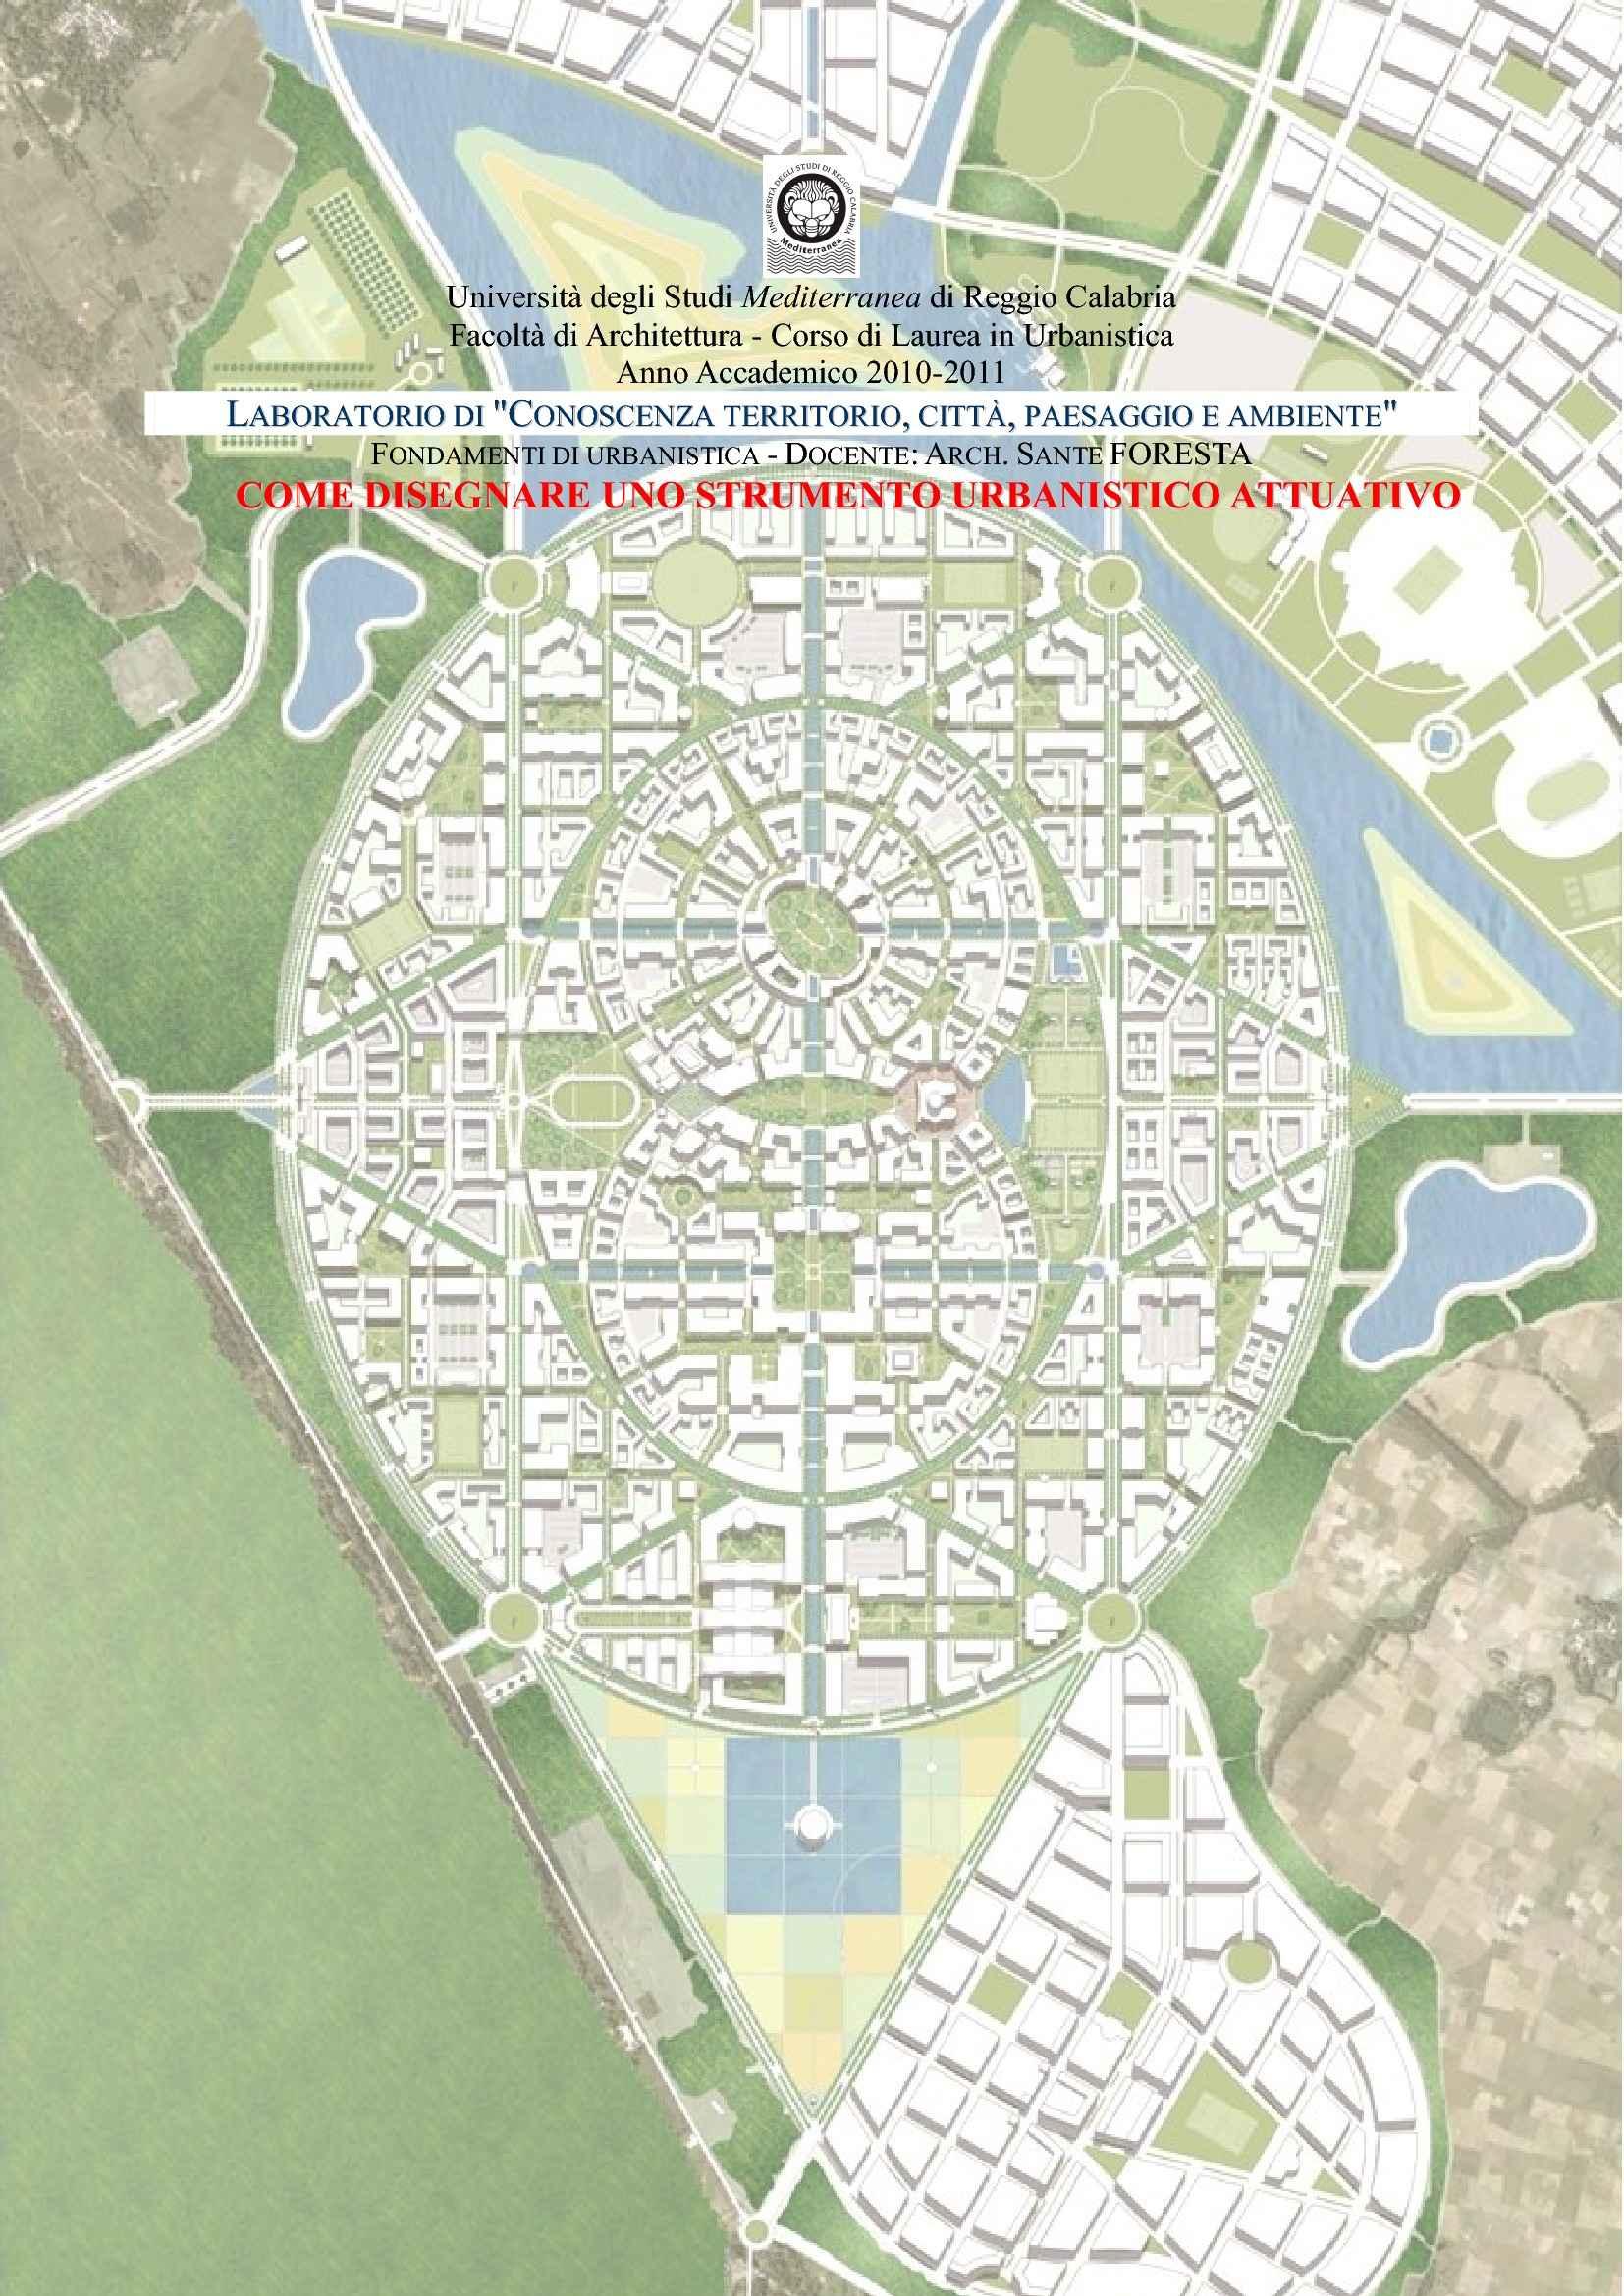 Urbanistica - Esempi di piani attuativi